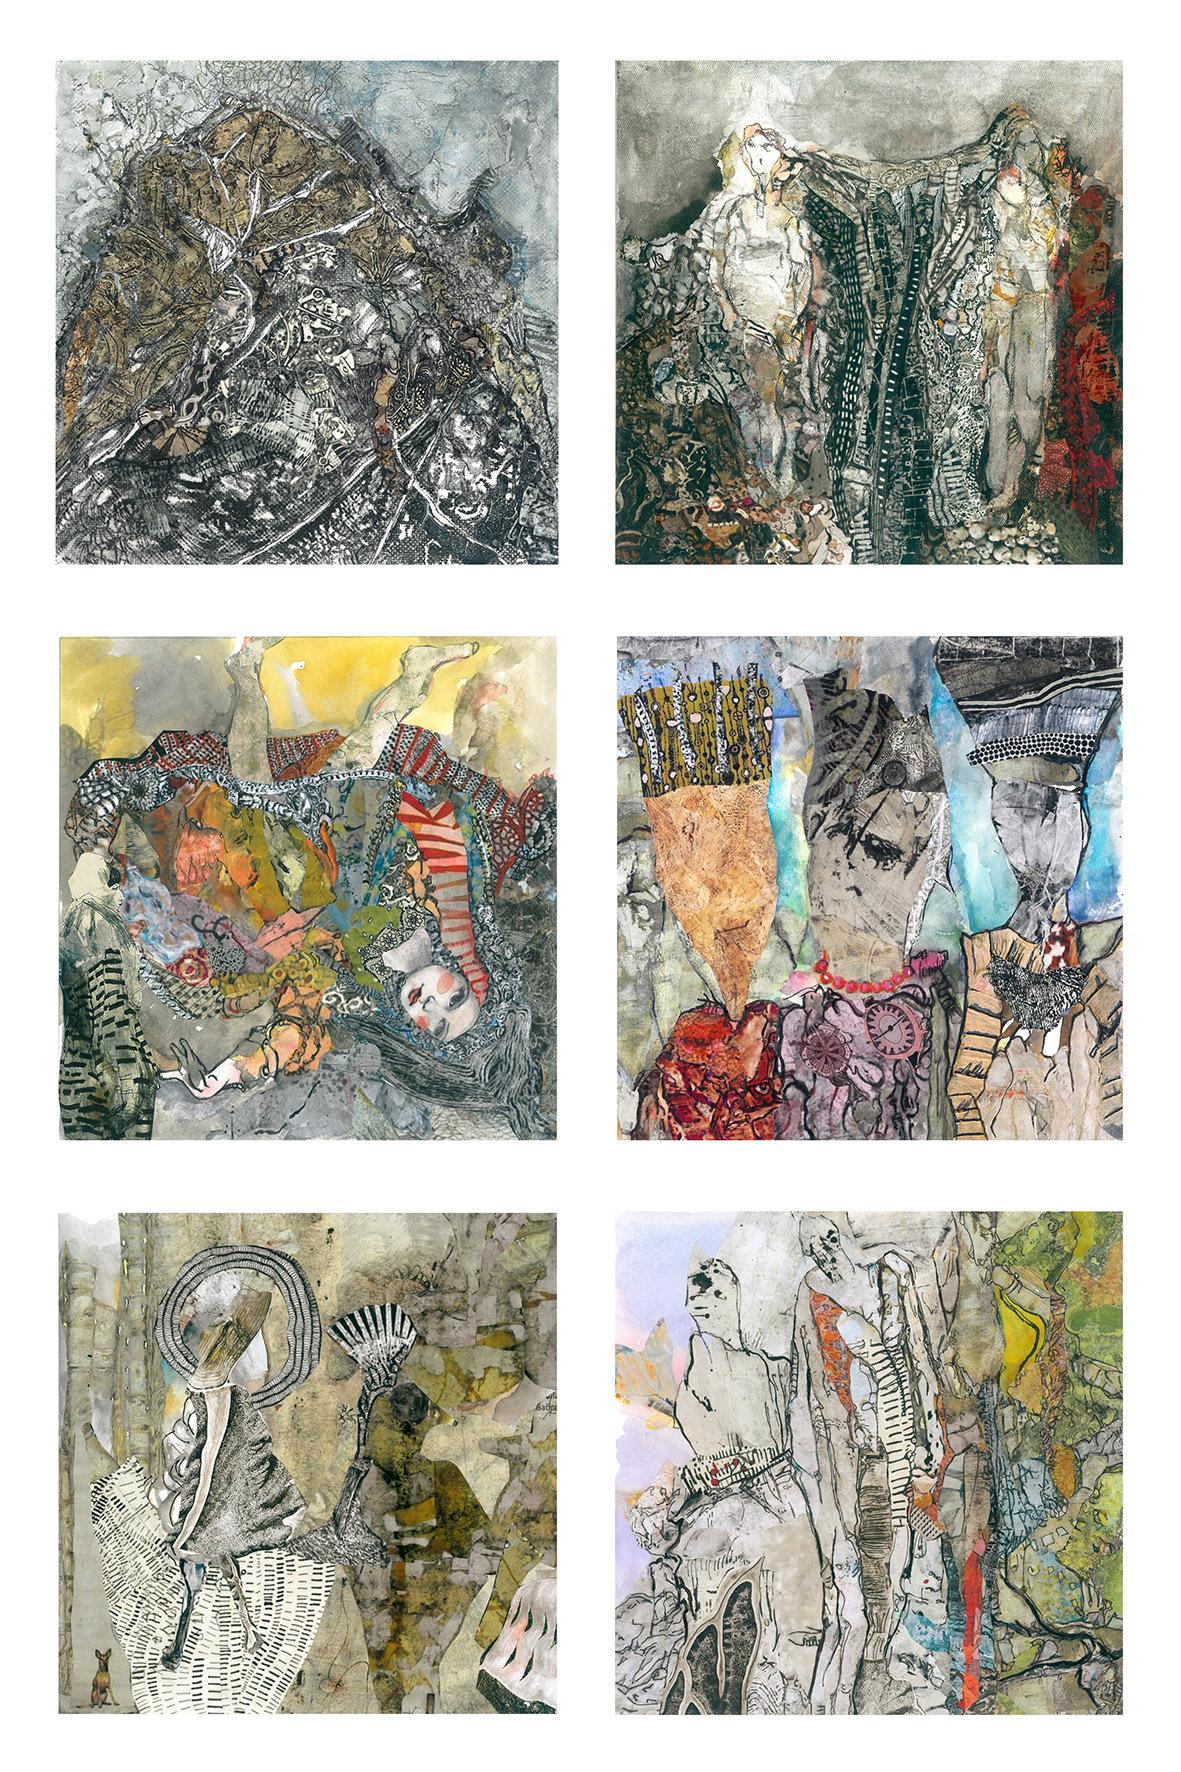 Sofia Papadopoulou, Untitled, mixed media, 25x25 cm each